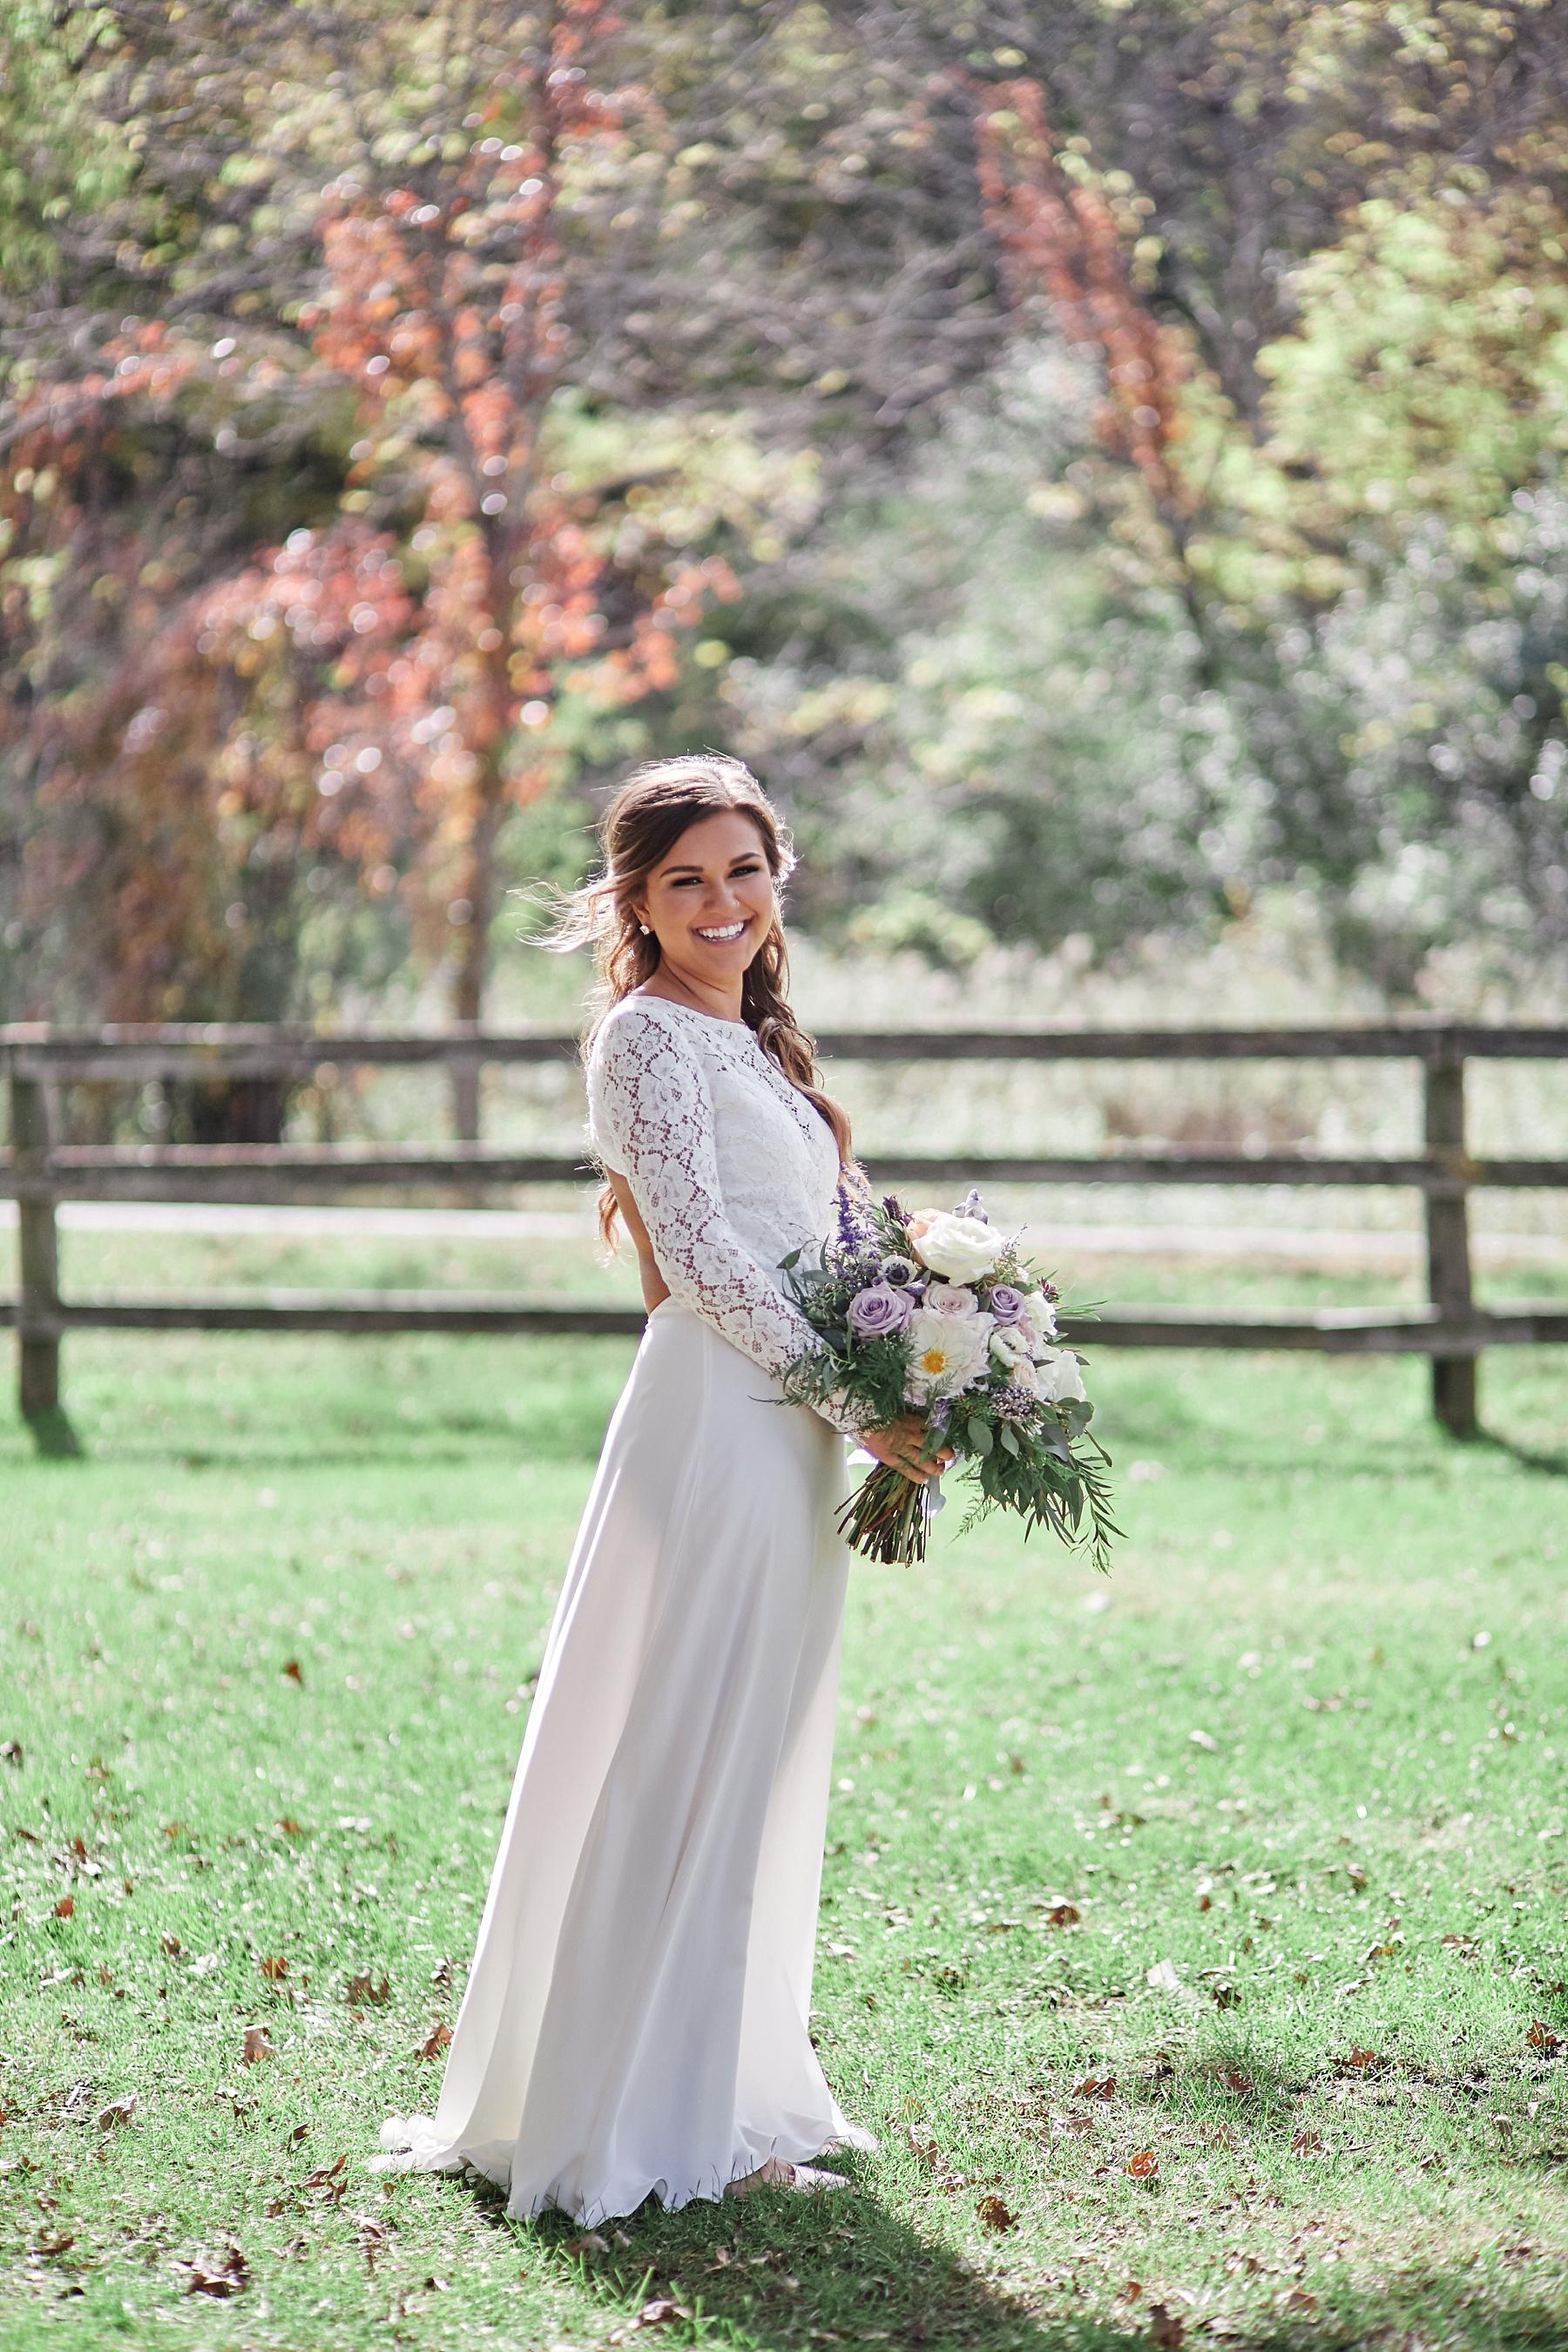 Maywood-Stone-Barn-Wedding-Rochester-Minnesota-Perry-James-Photo_0595.jpg